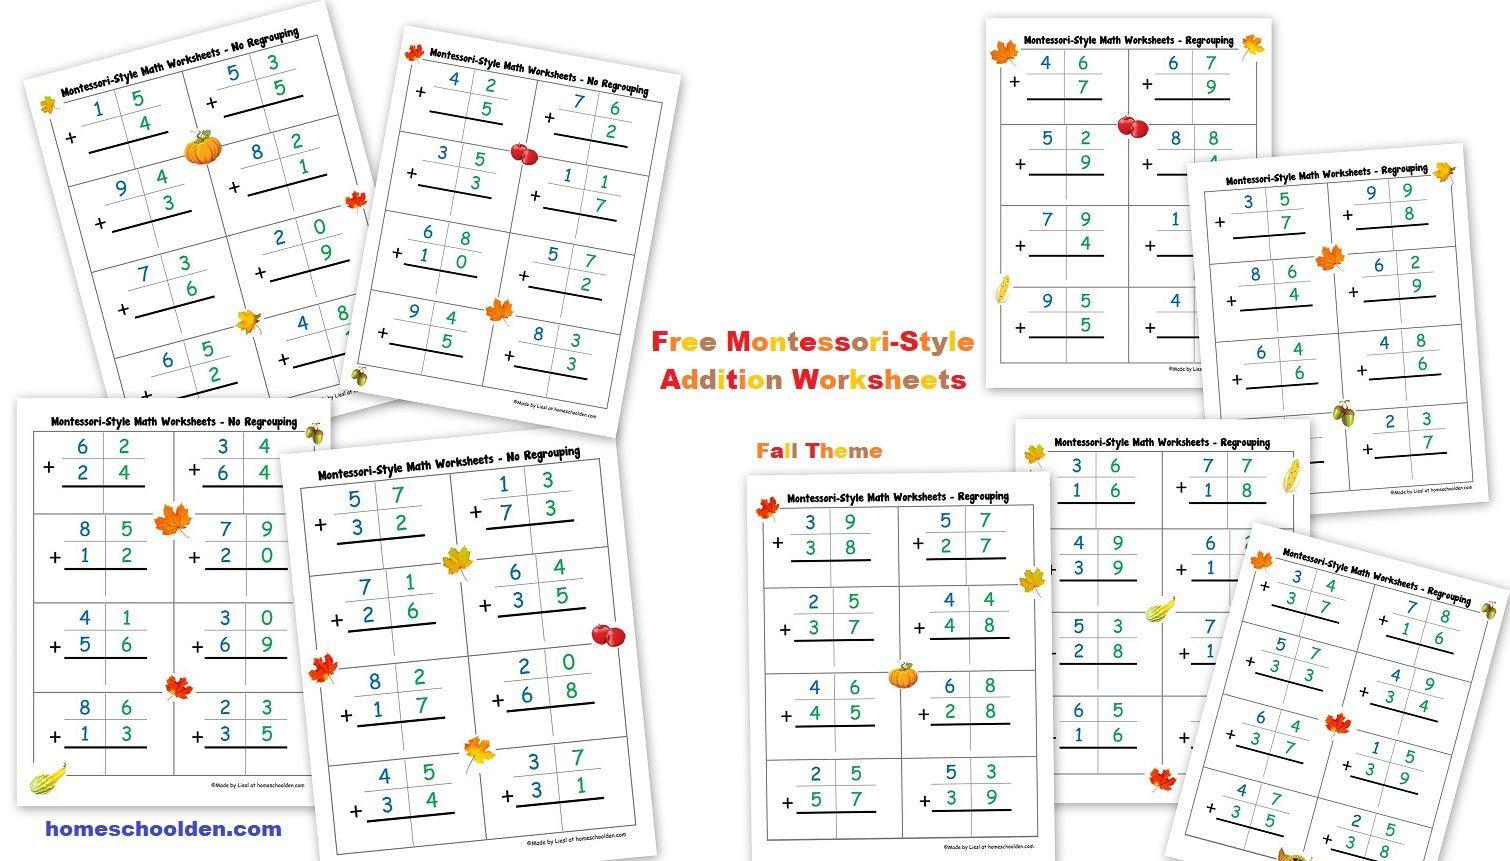 worksheet Montessori Printable Worksheets free fall montessori addition worksheets worksheets